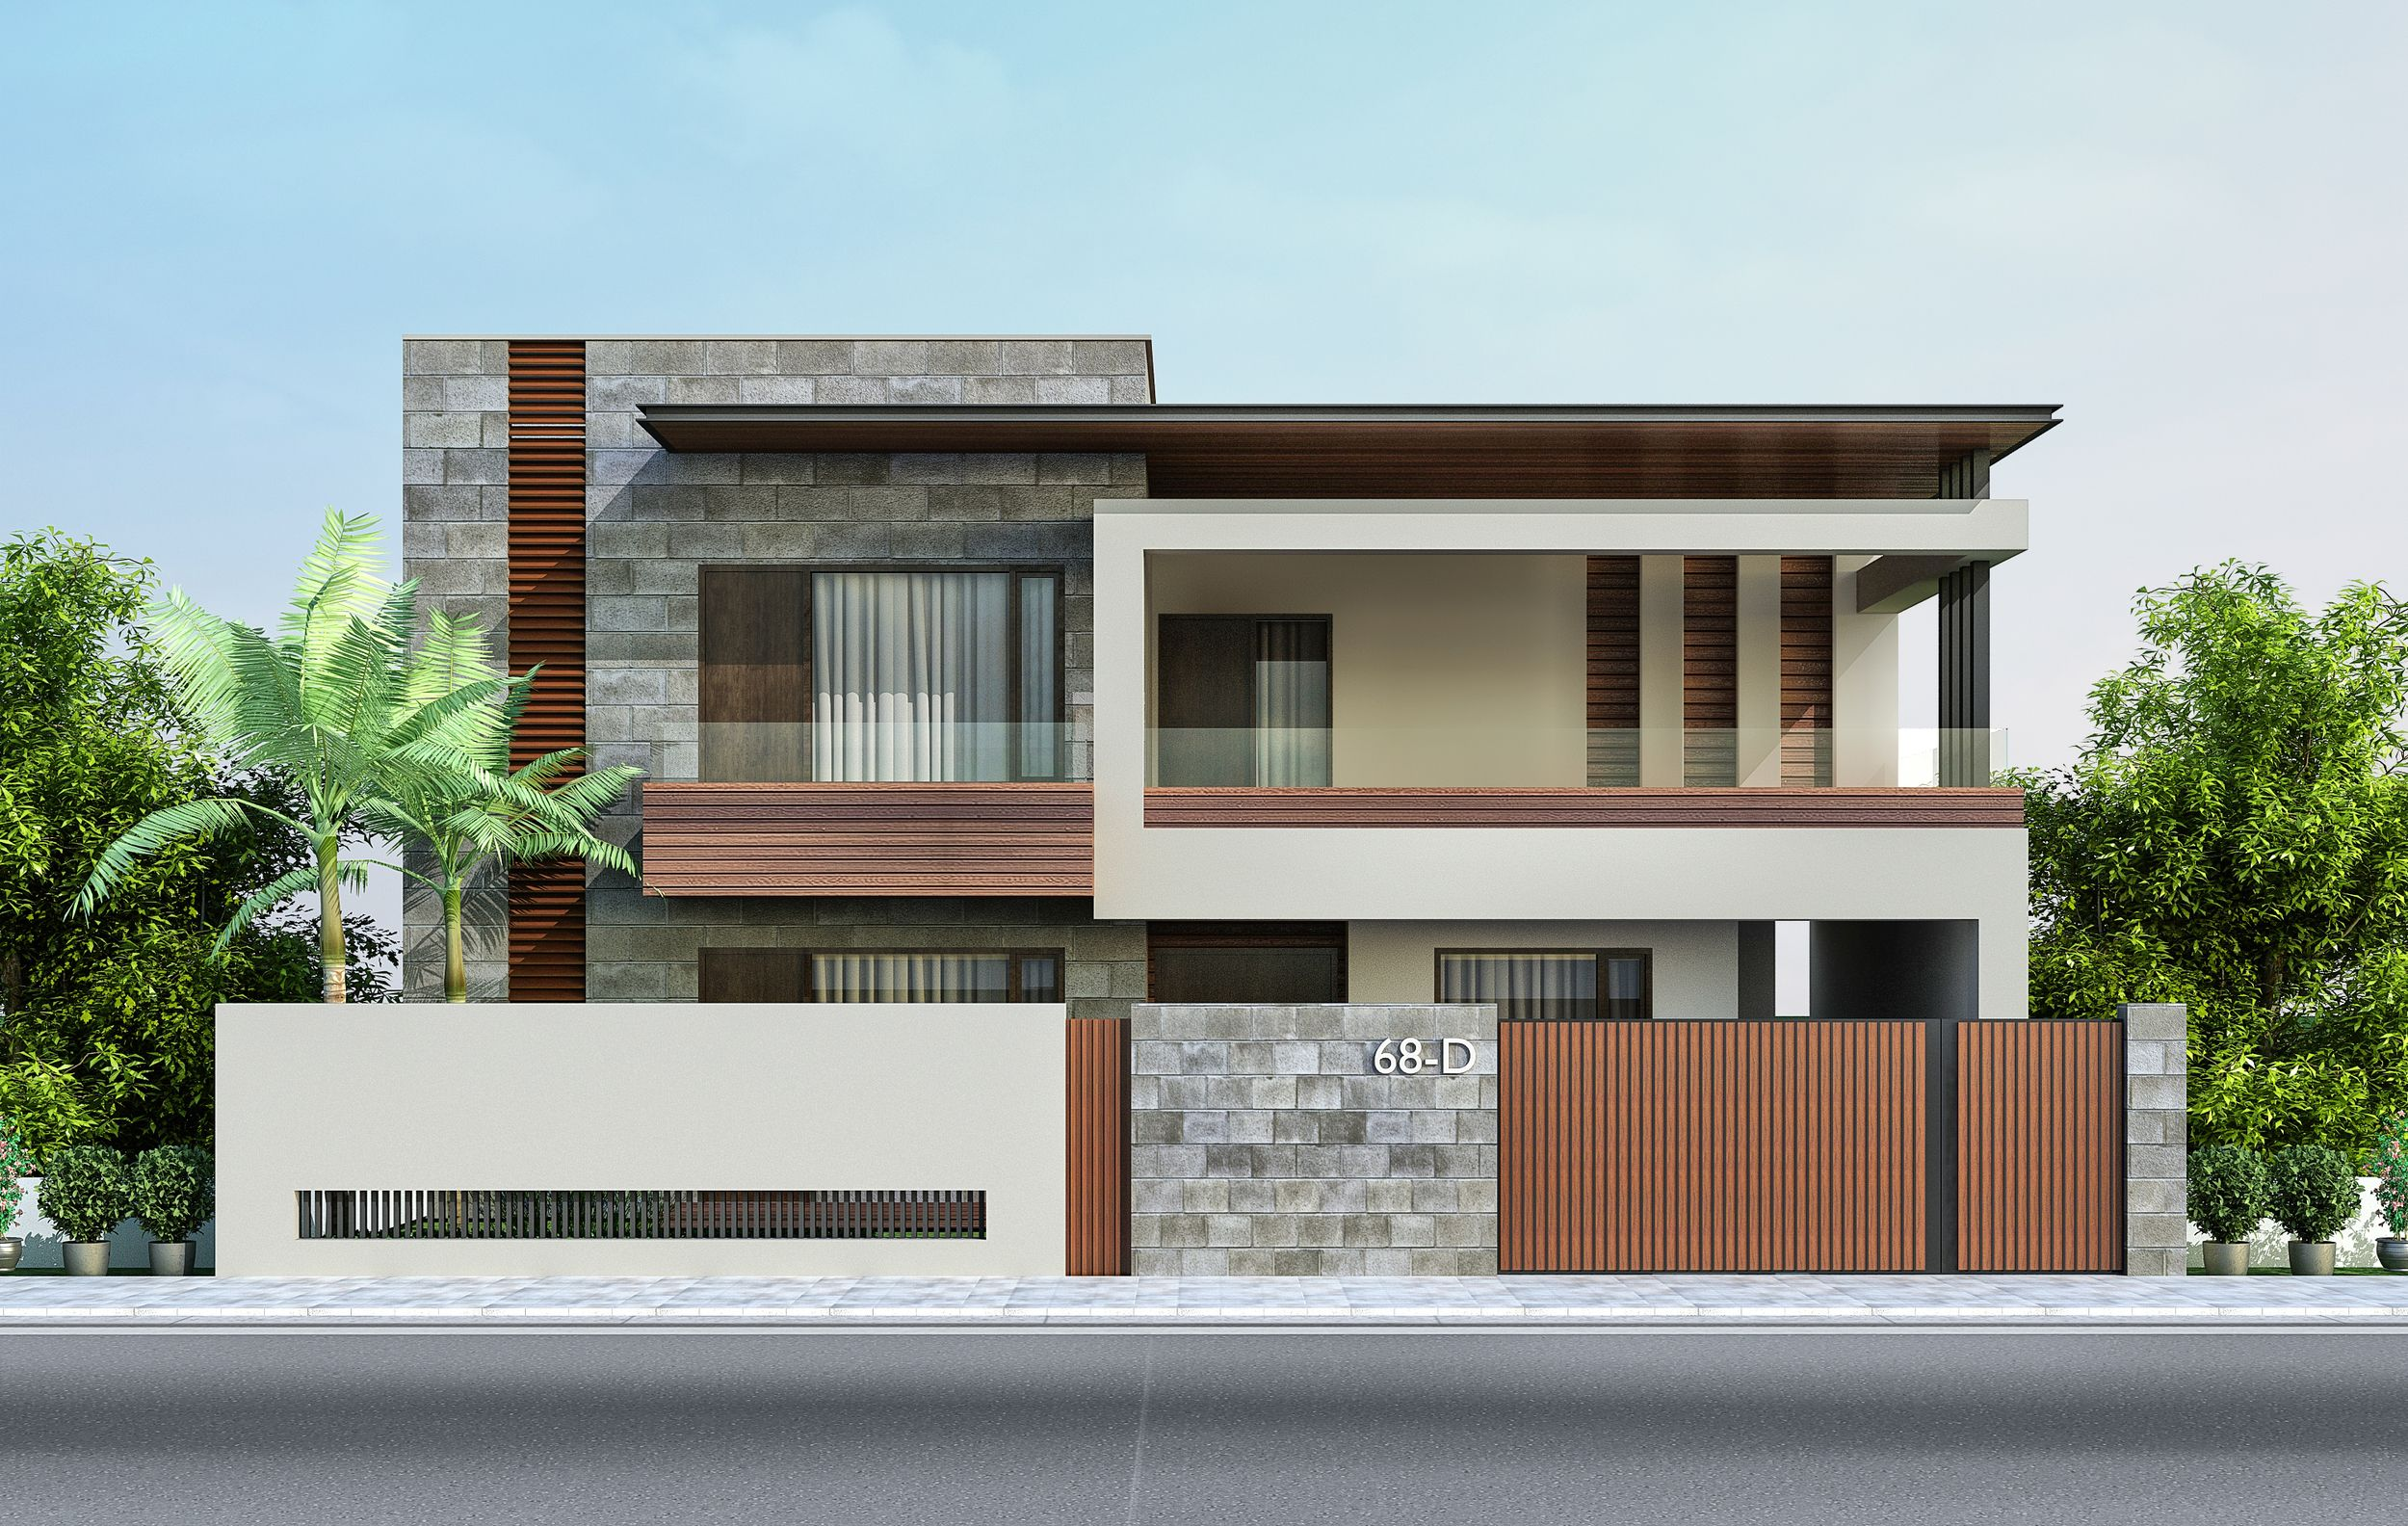 House elevation front modern exterior design also pin by karen lin on  interior decor pinterest rh